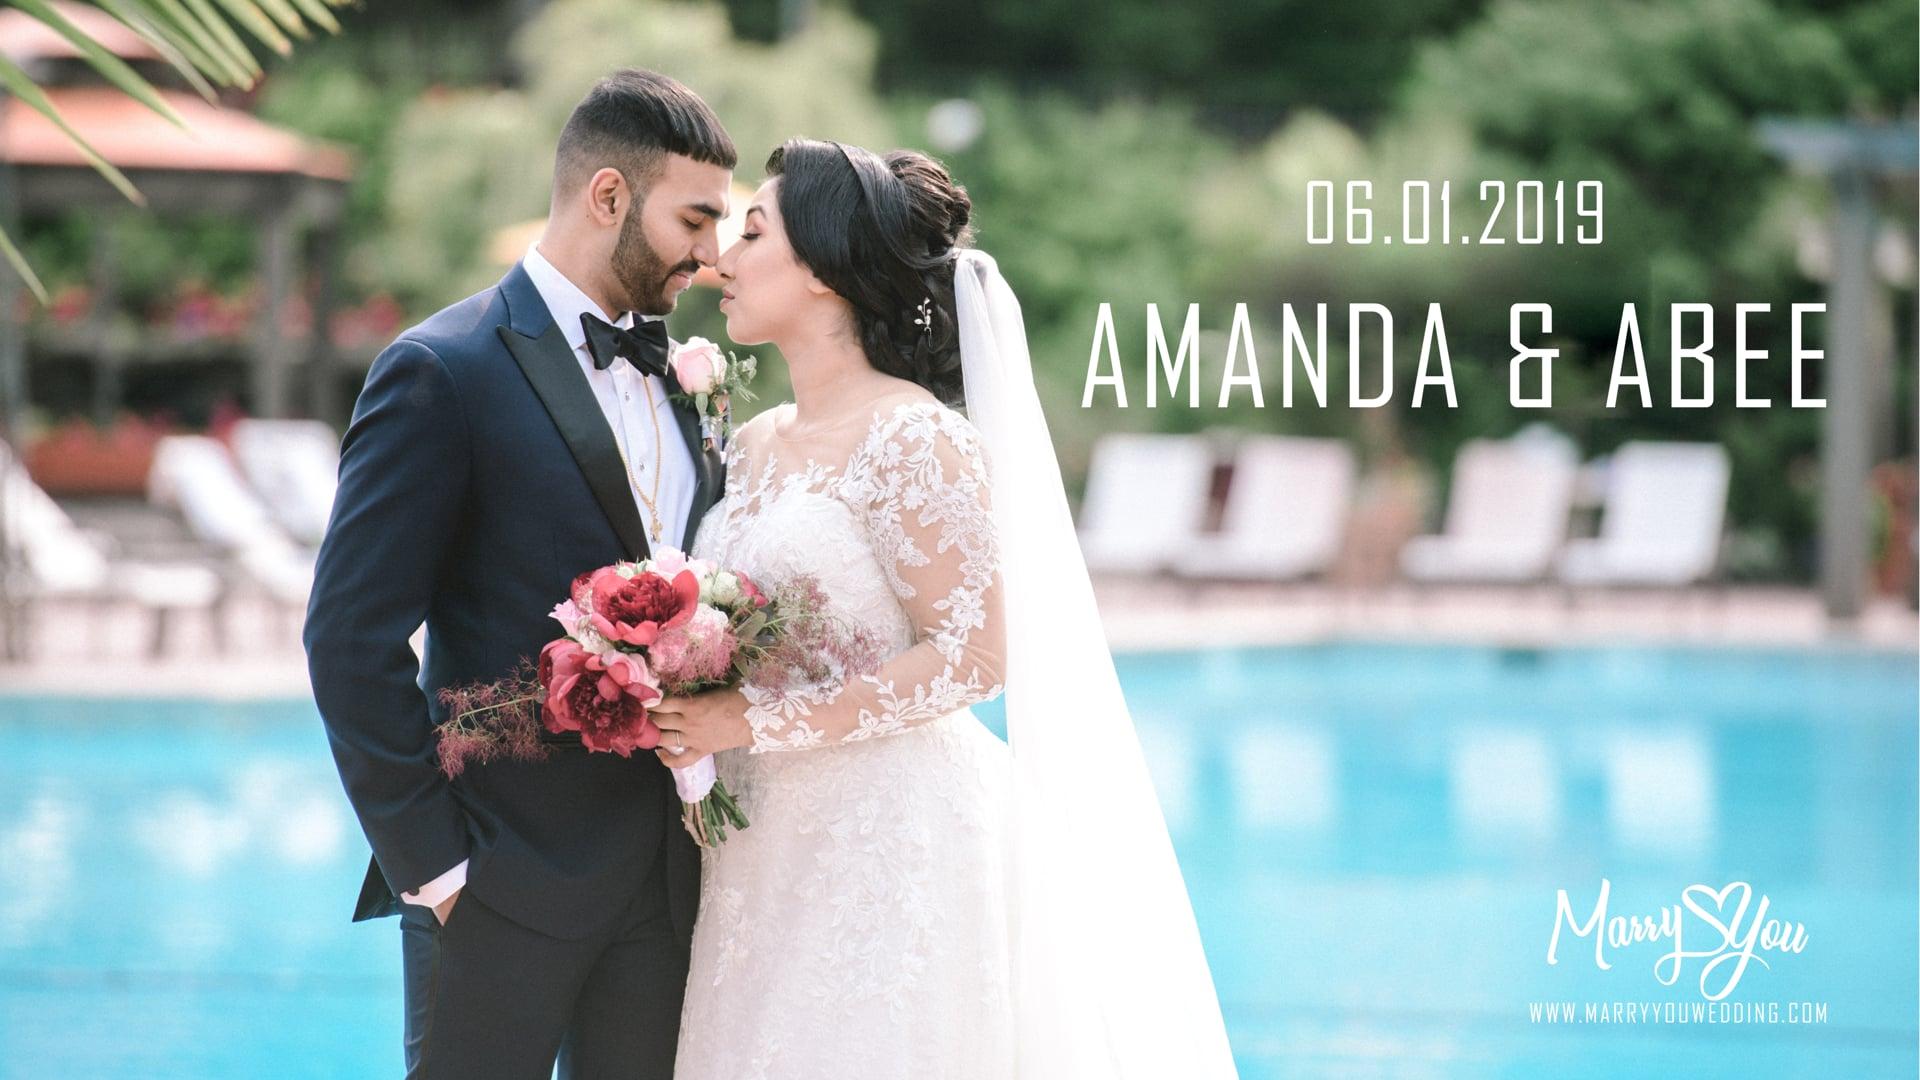 Amanda & Abee 06-01-19 Same Day Editing